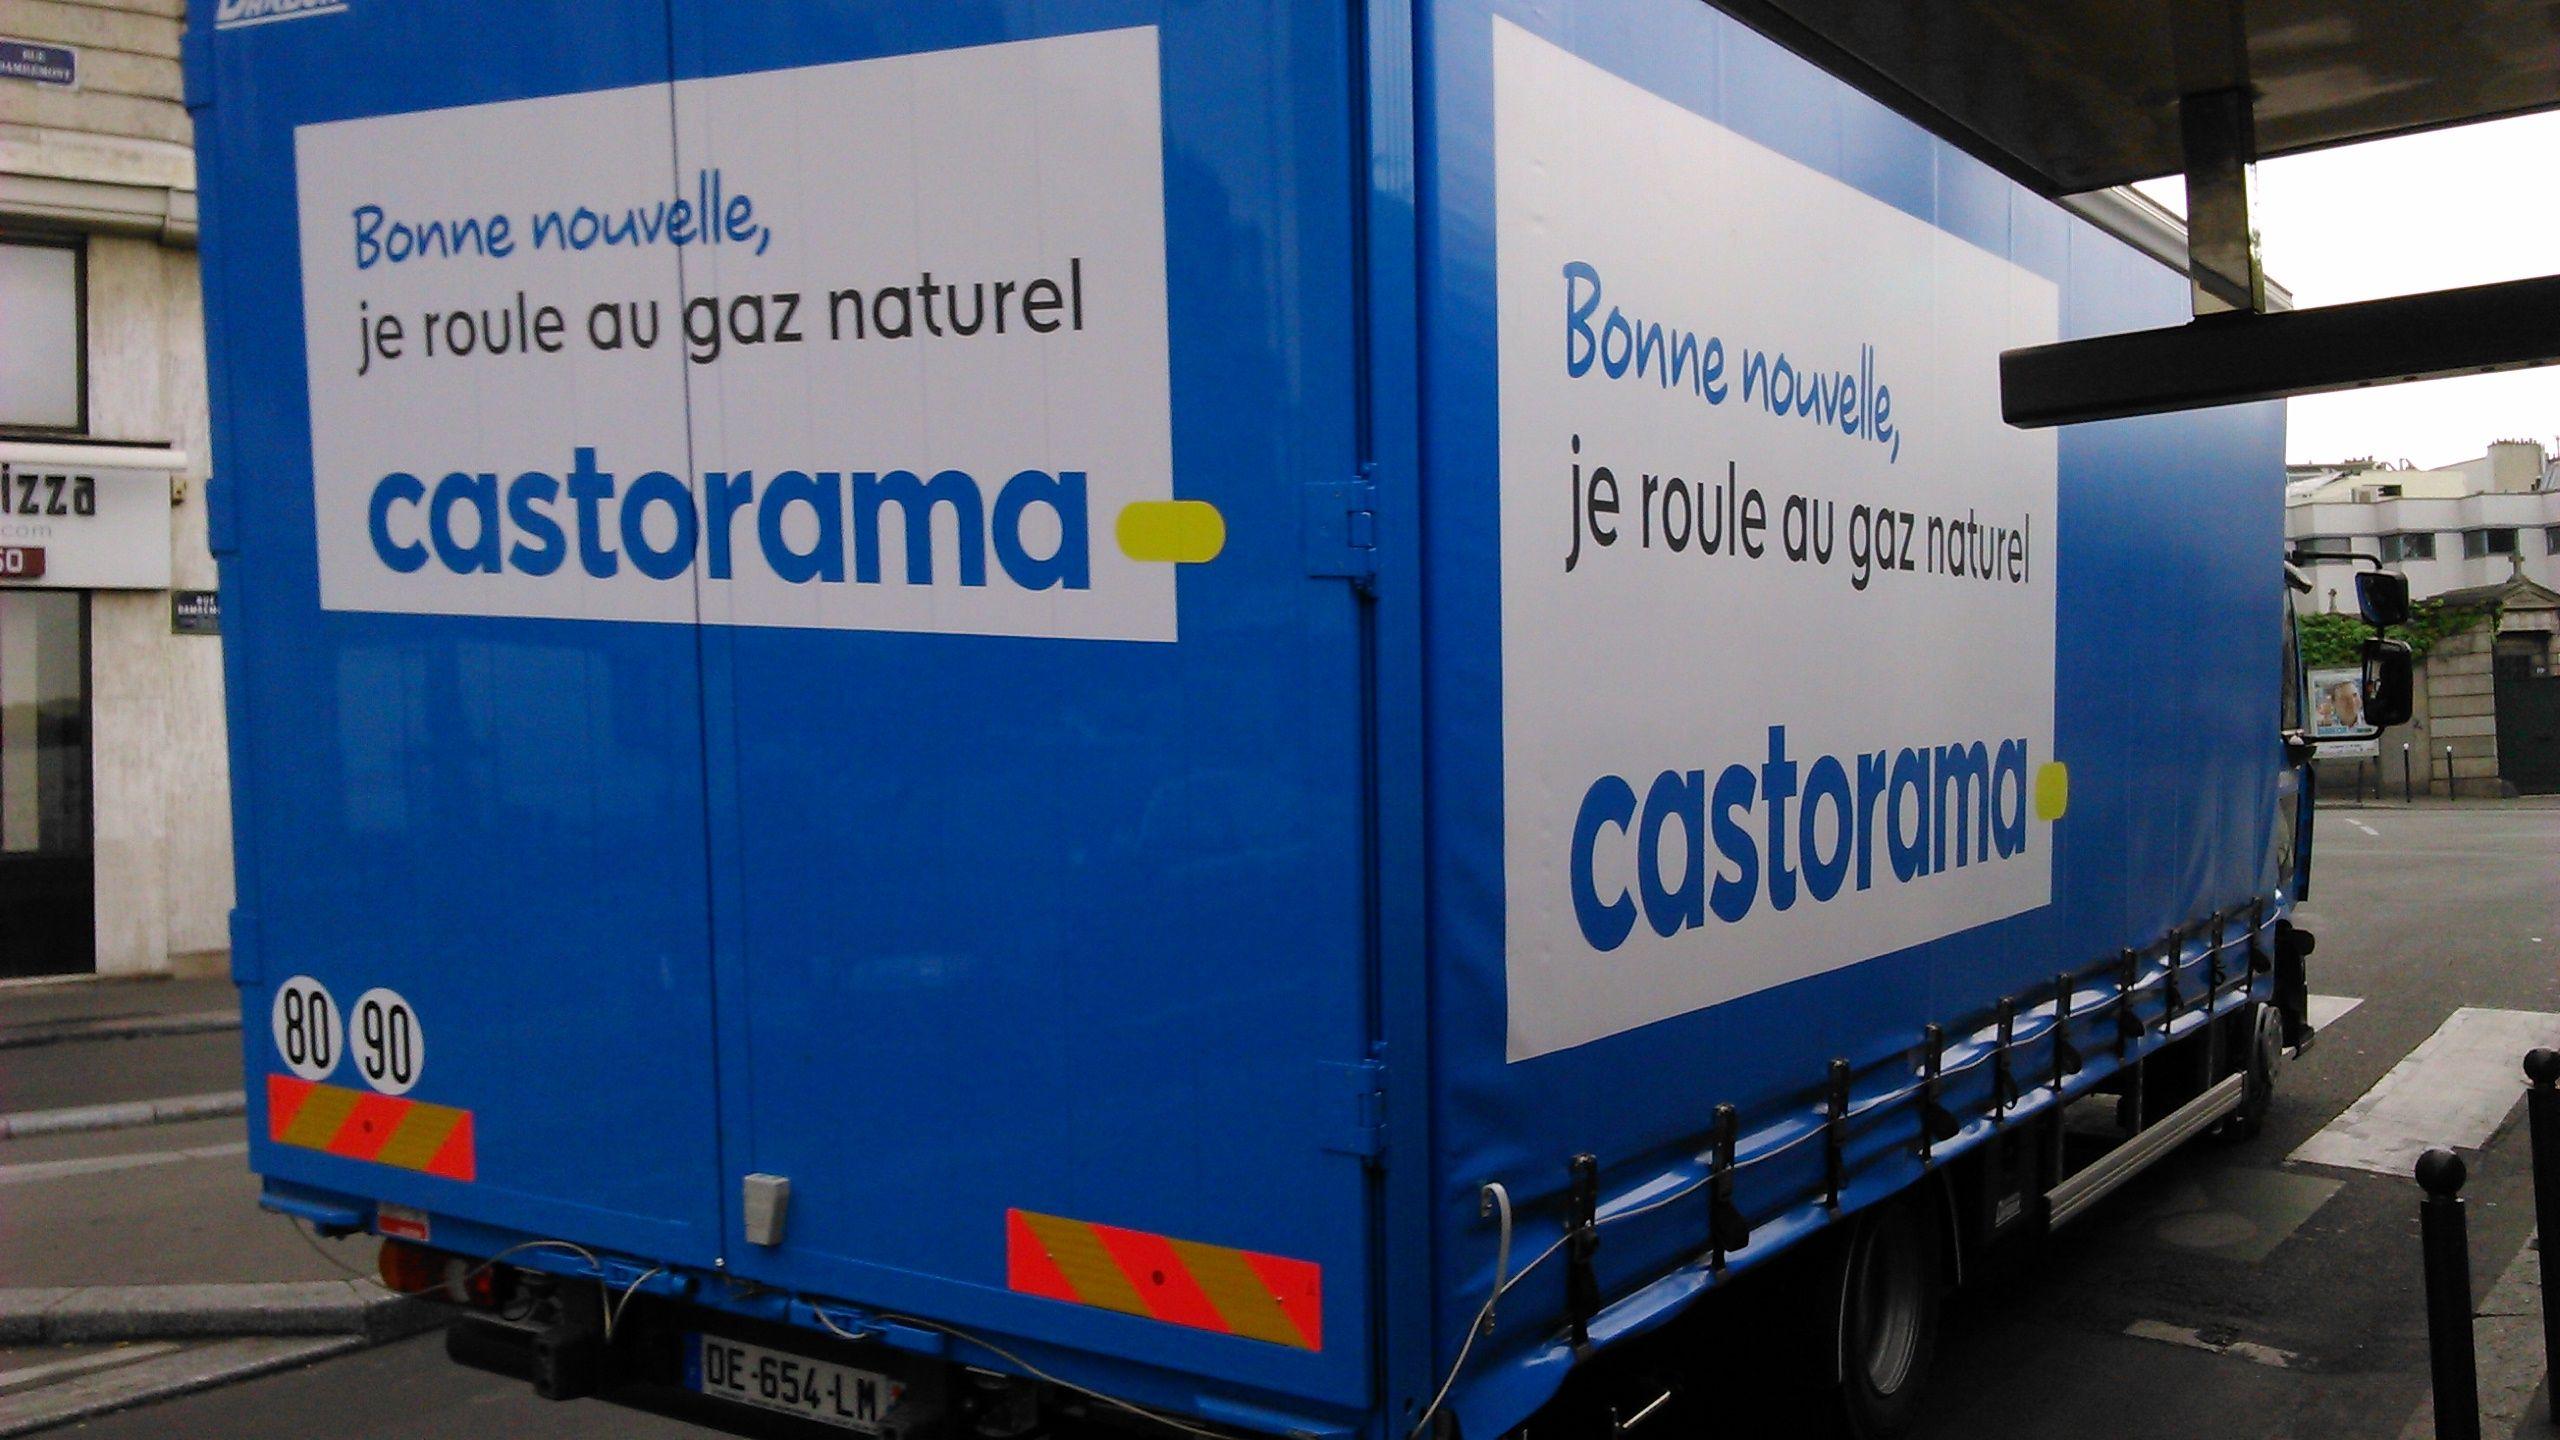 Camion Renault Trucks Pvi Au Gnv Location Camion Castorama Camion